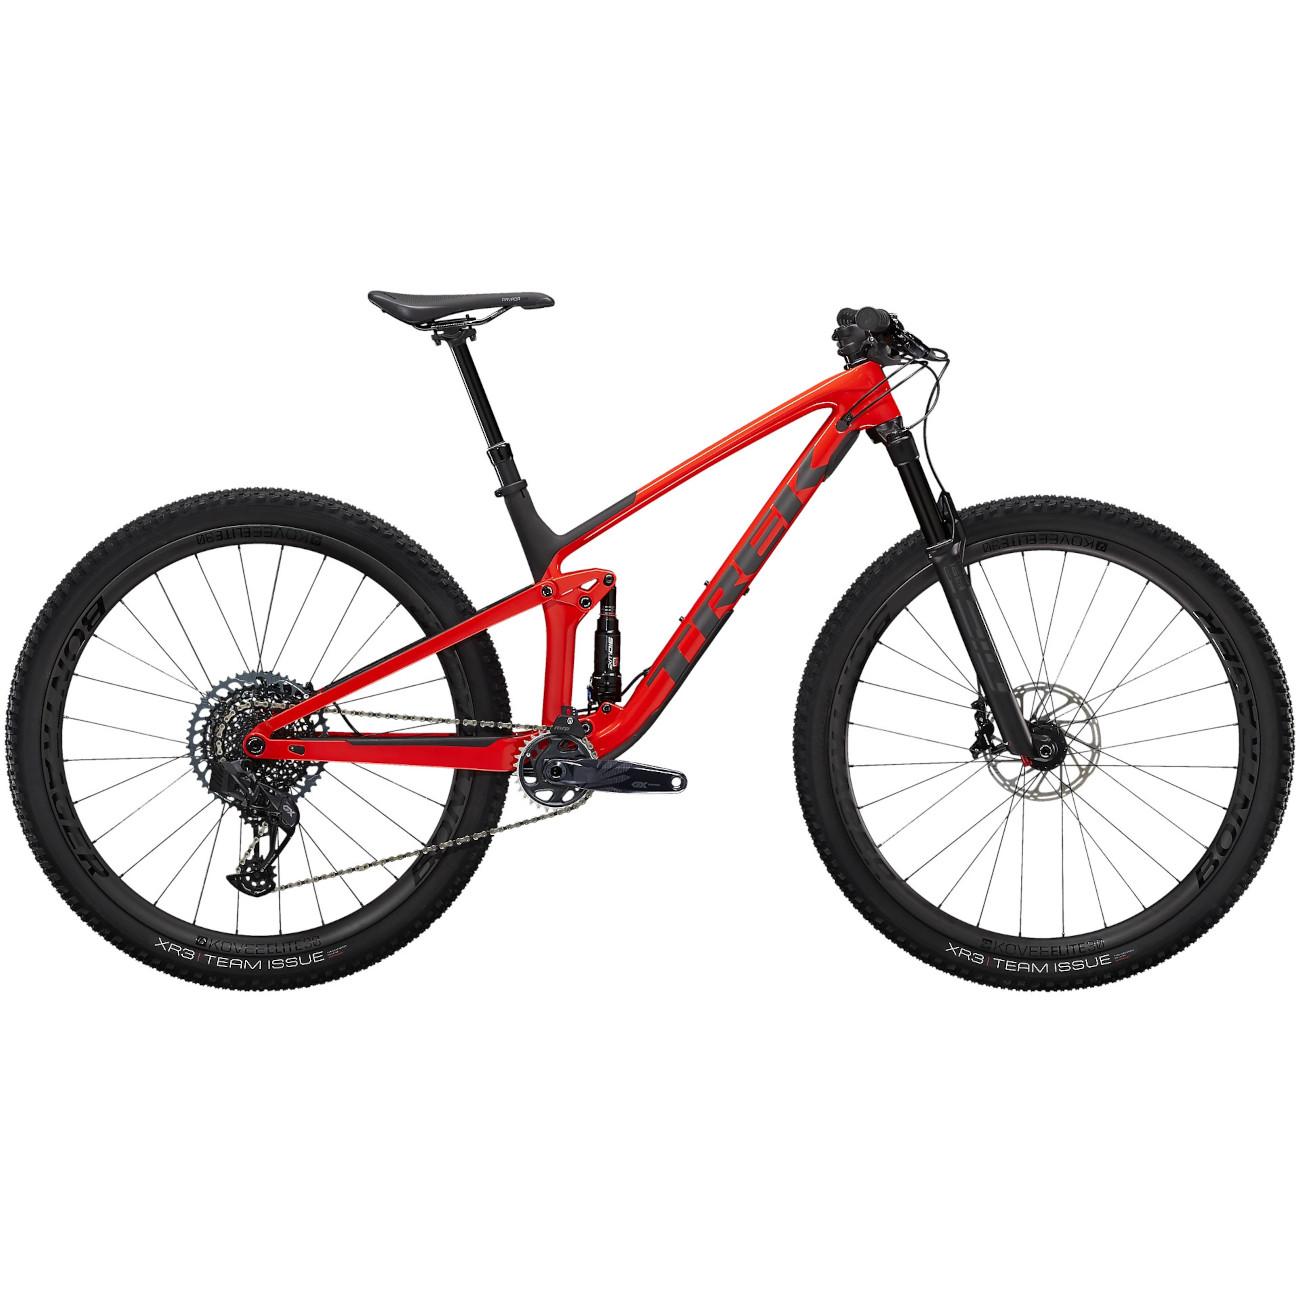 "Trek TOP FUEL 9.8 GX AXS 29"" Mountainbike - 2021 - Gloss Red / Matte Carbon Smoke"